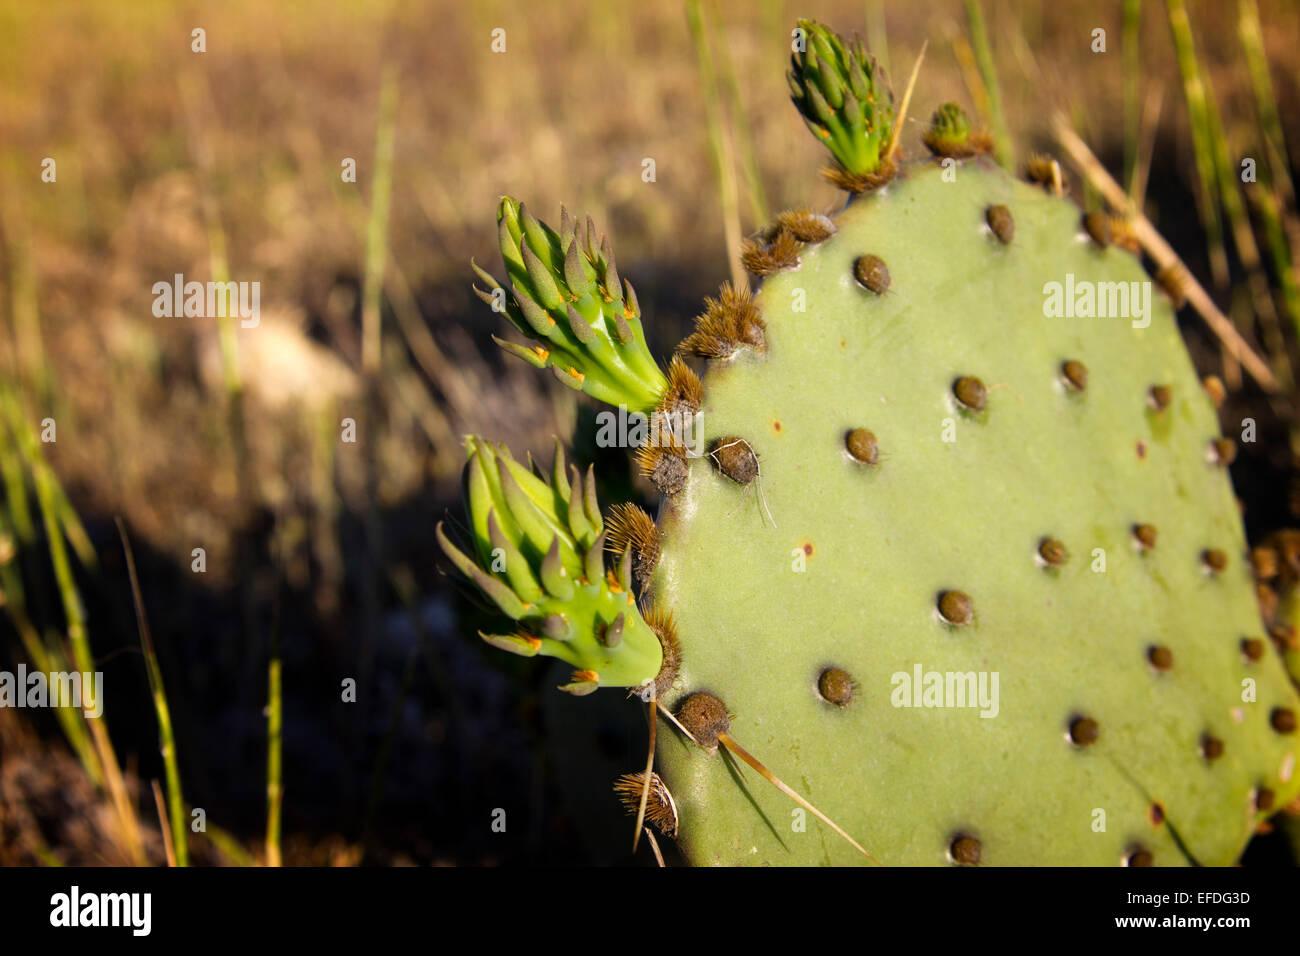 Knospen auf Opuntia Kaktus auch bekannt als Nopales oder Paddel Kaktus oder Prickley Pear cactus Stockbild